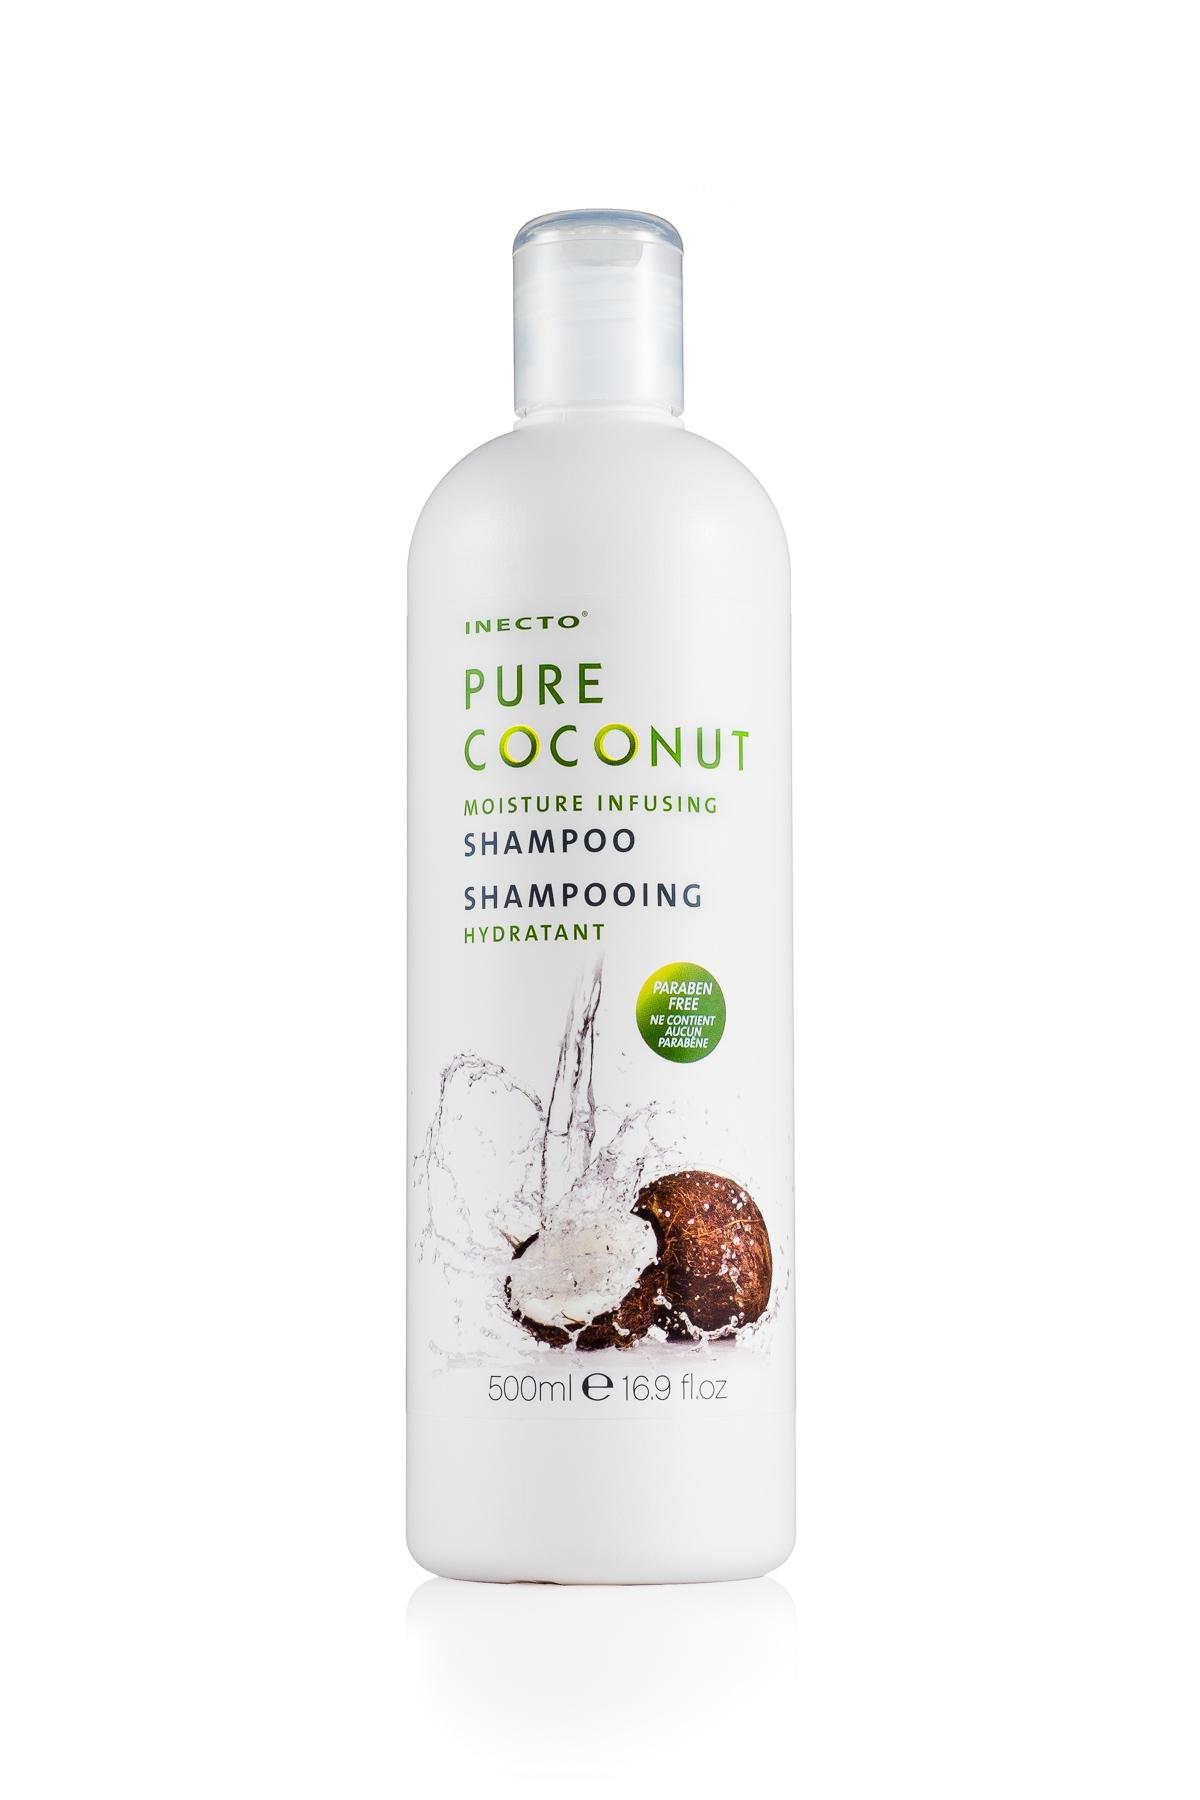 Pure Coconut shampoo